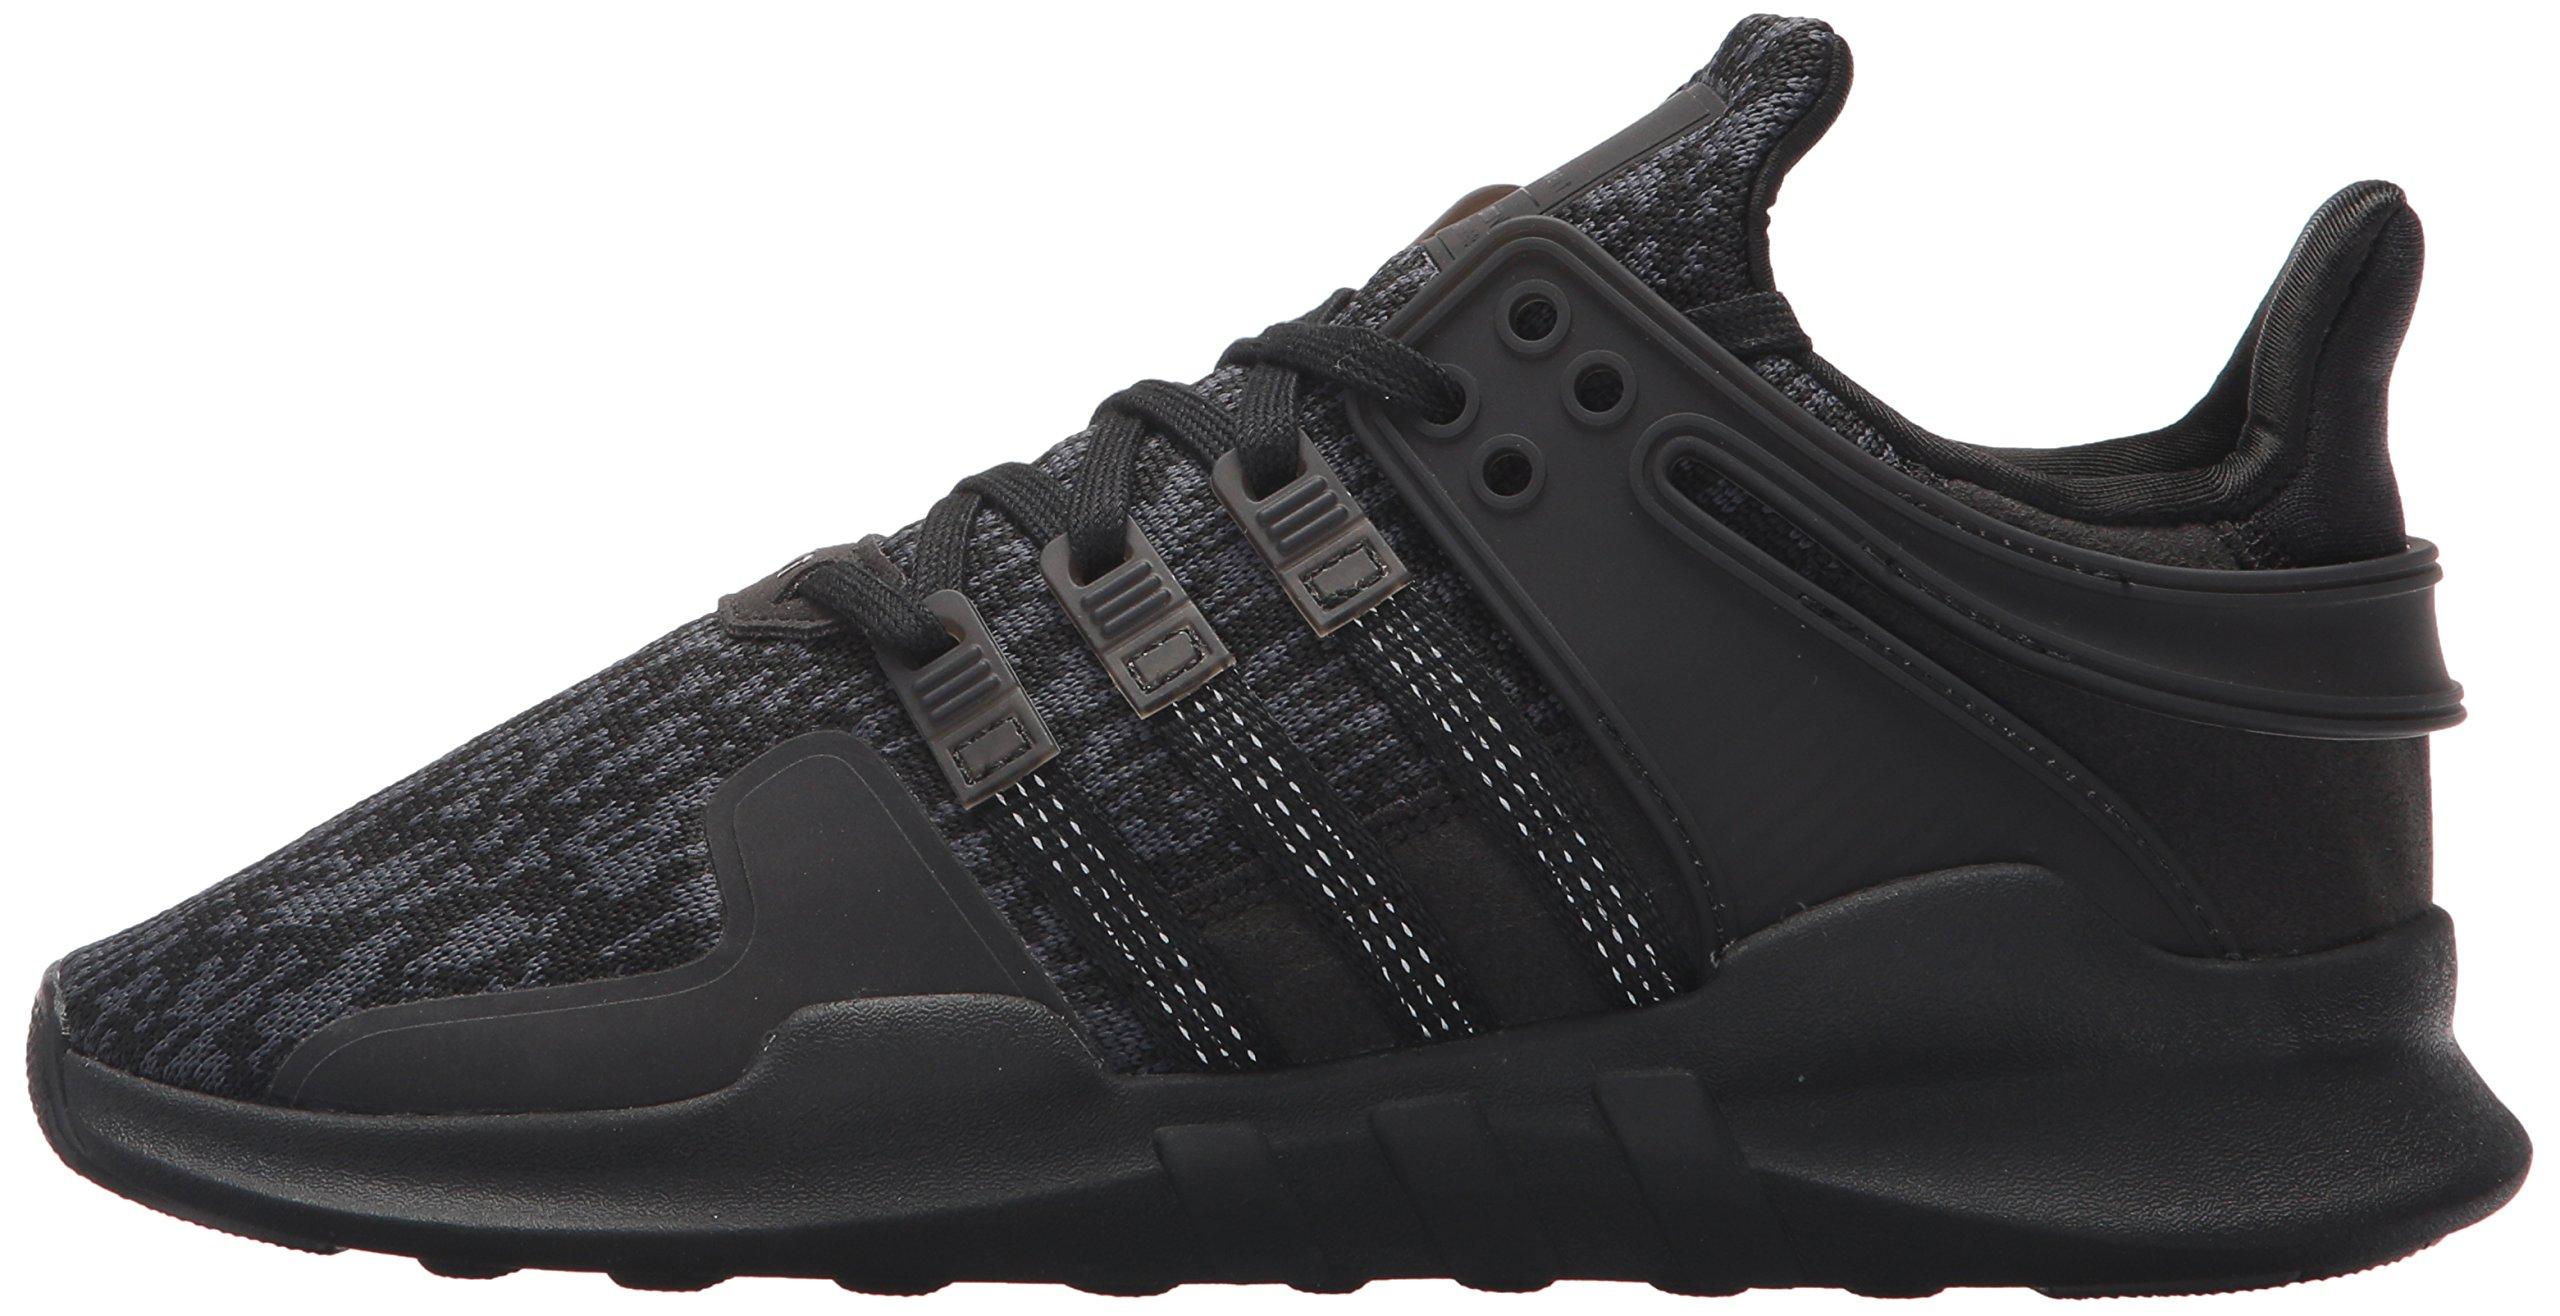 adidas Originals Boys' EQT Support ADV J Running Shoe, Black, 6.5 M US Big Kid by adidas Originals (Image #5)